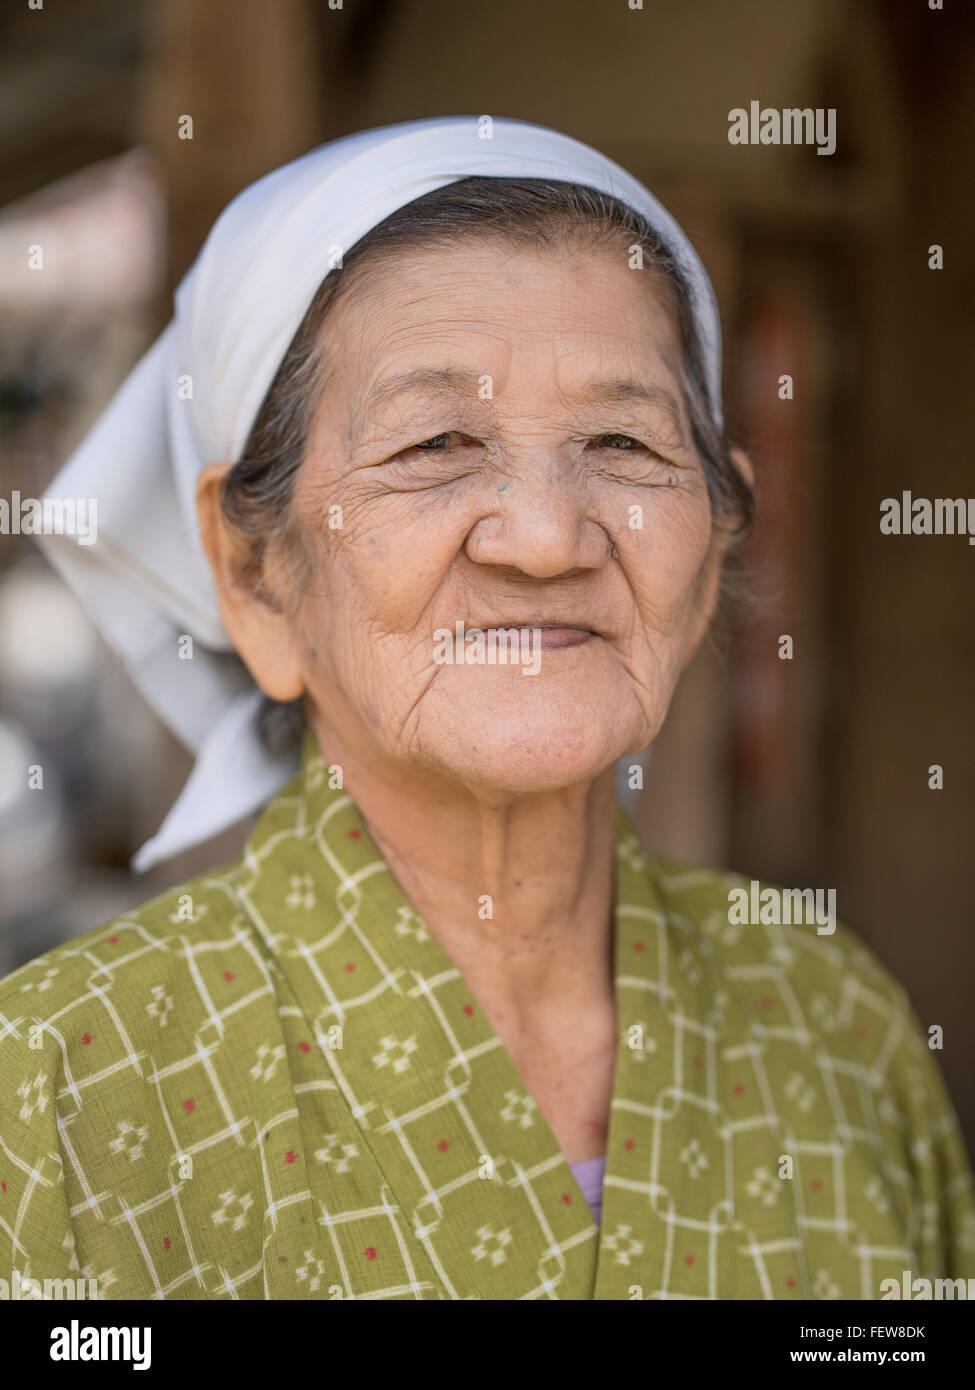 Elderly Okinawan woman wearing traditional clothing, Ryukyu Mura, Okinawa. Okinawan women have very long life expectancy - Stock Image